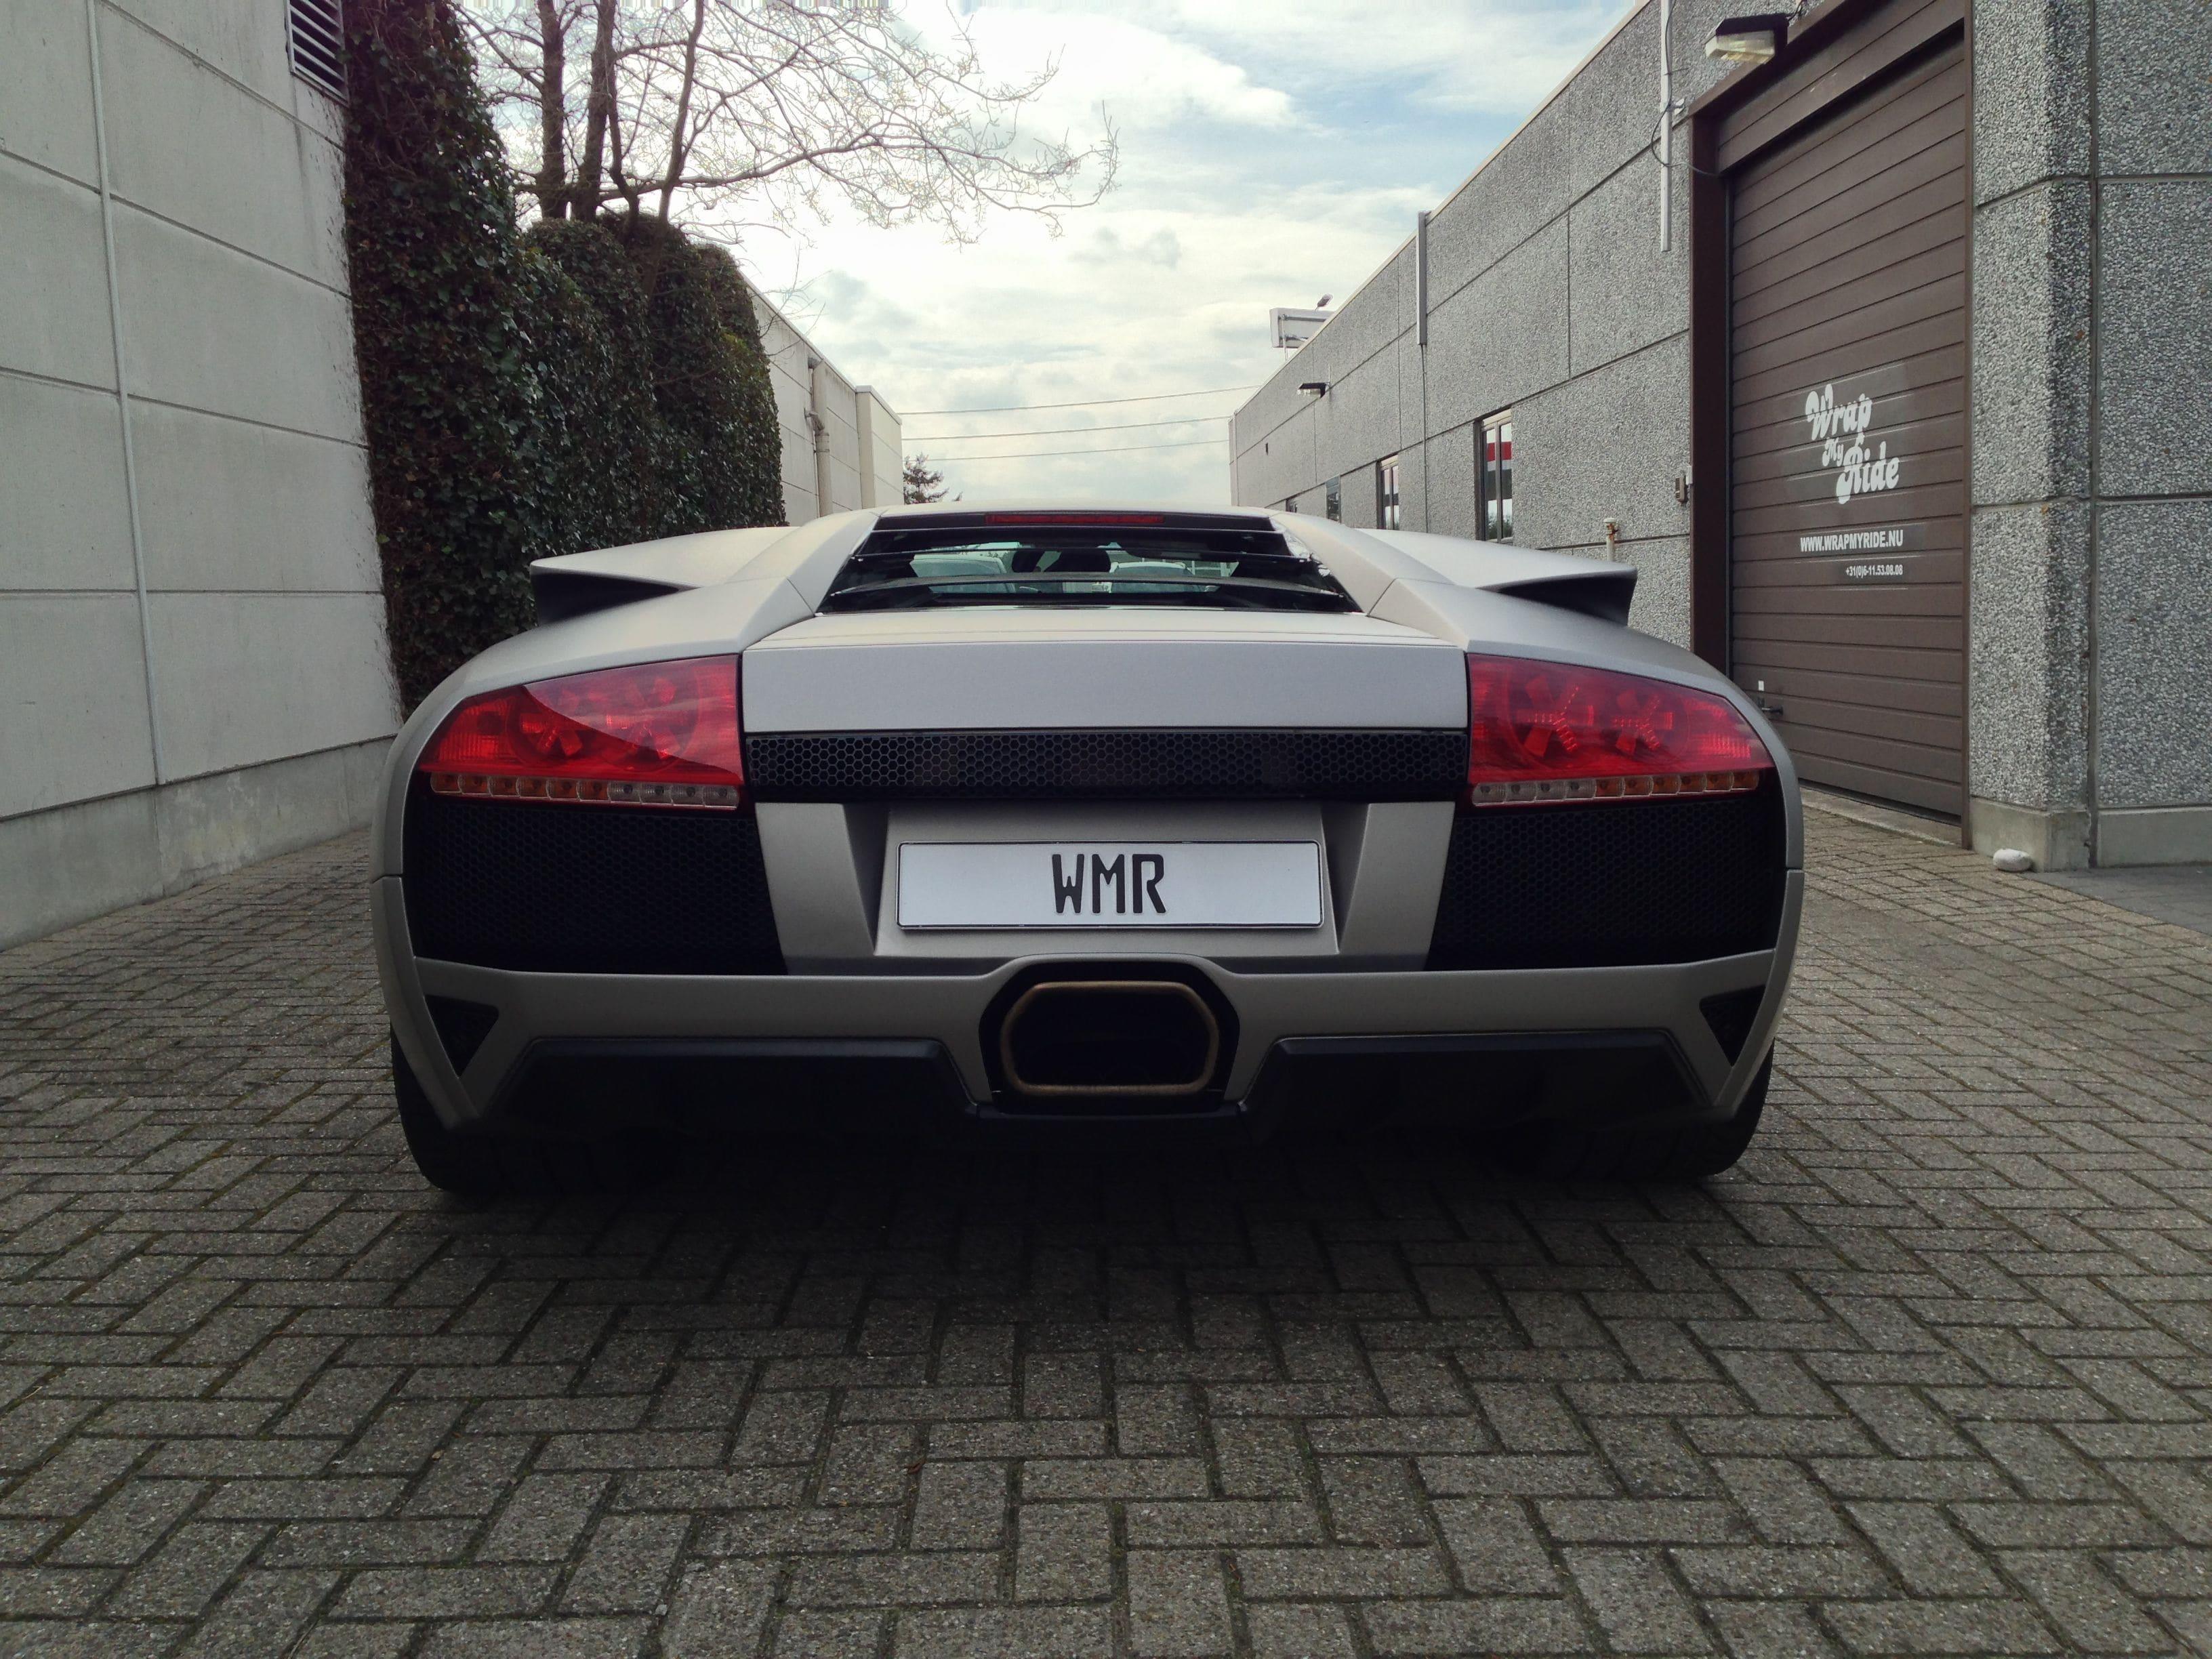 Lamborghini Murcialago LP670 met Gunpowder Wrap, Carwrapping door Wrapmyride.nu Foto-nr:5989, ©2021